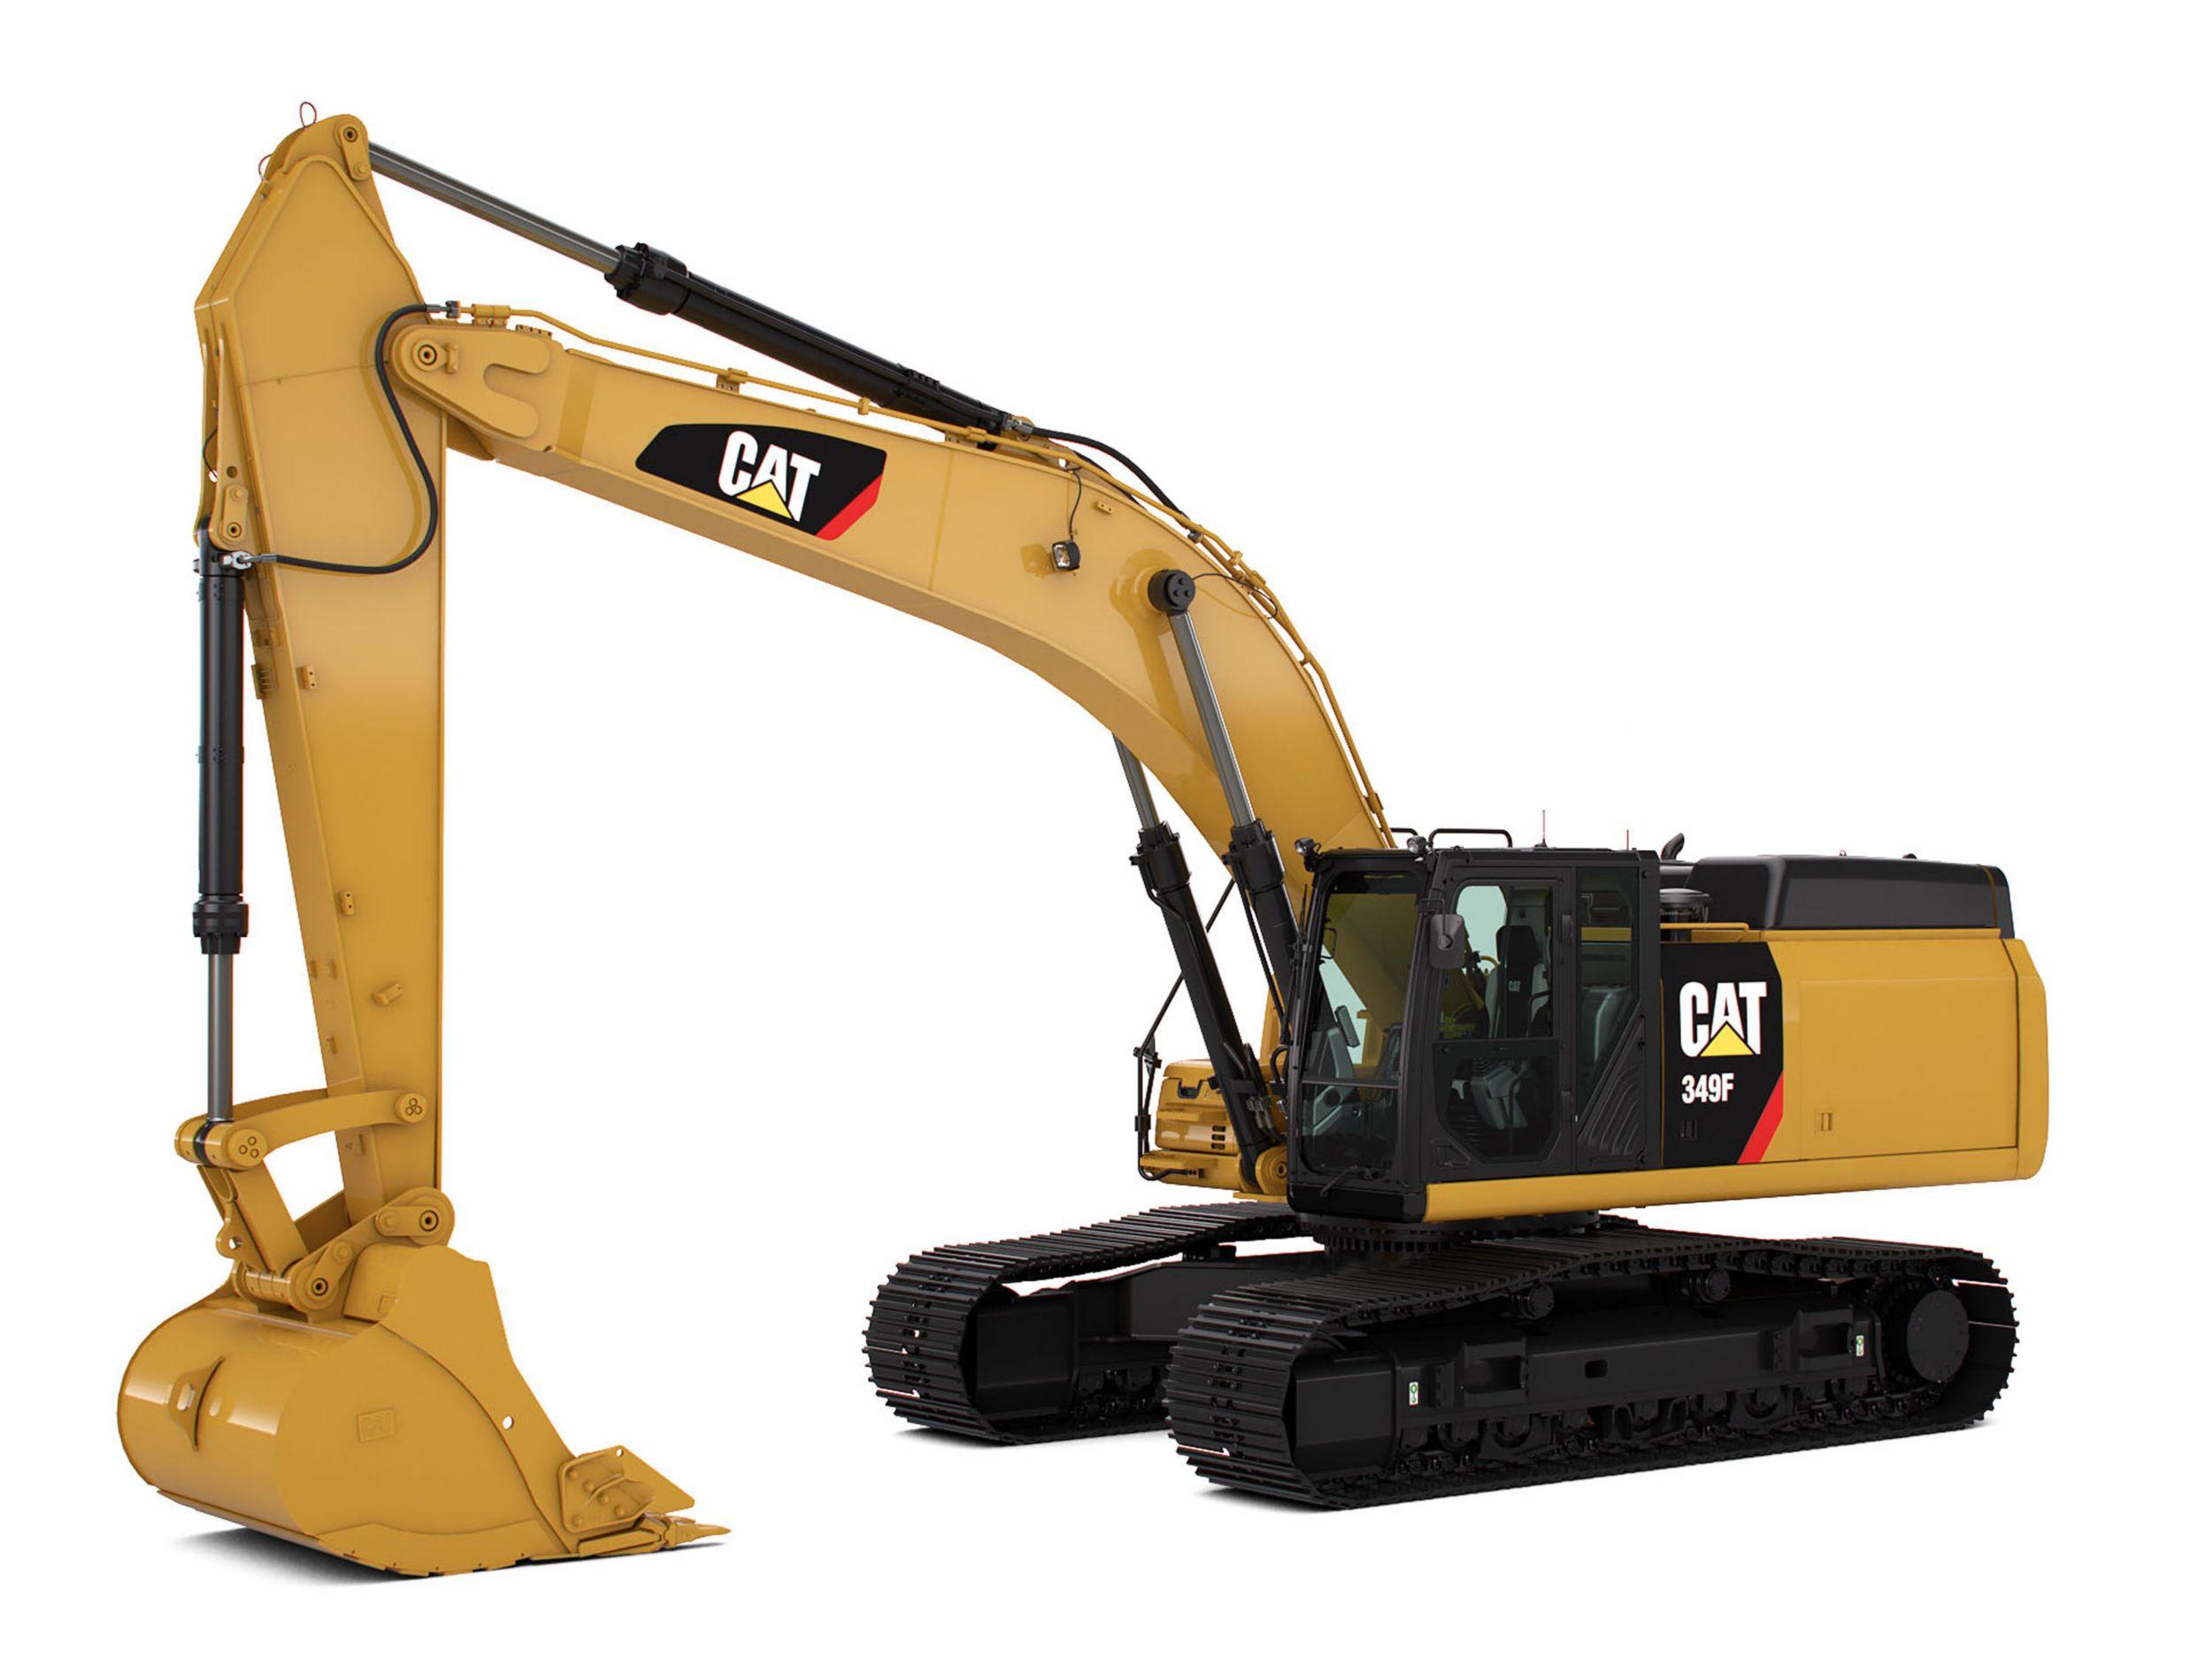 349F L Hydraulic Excavator